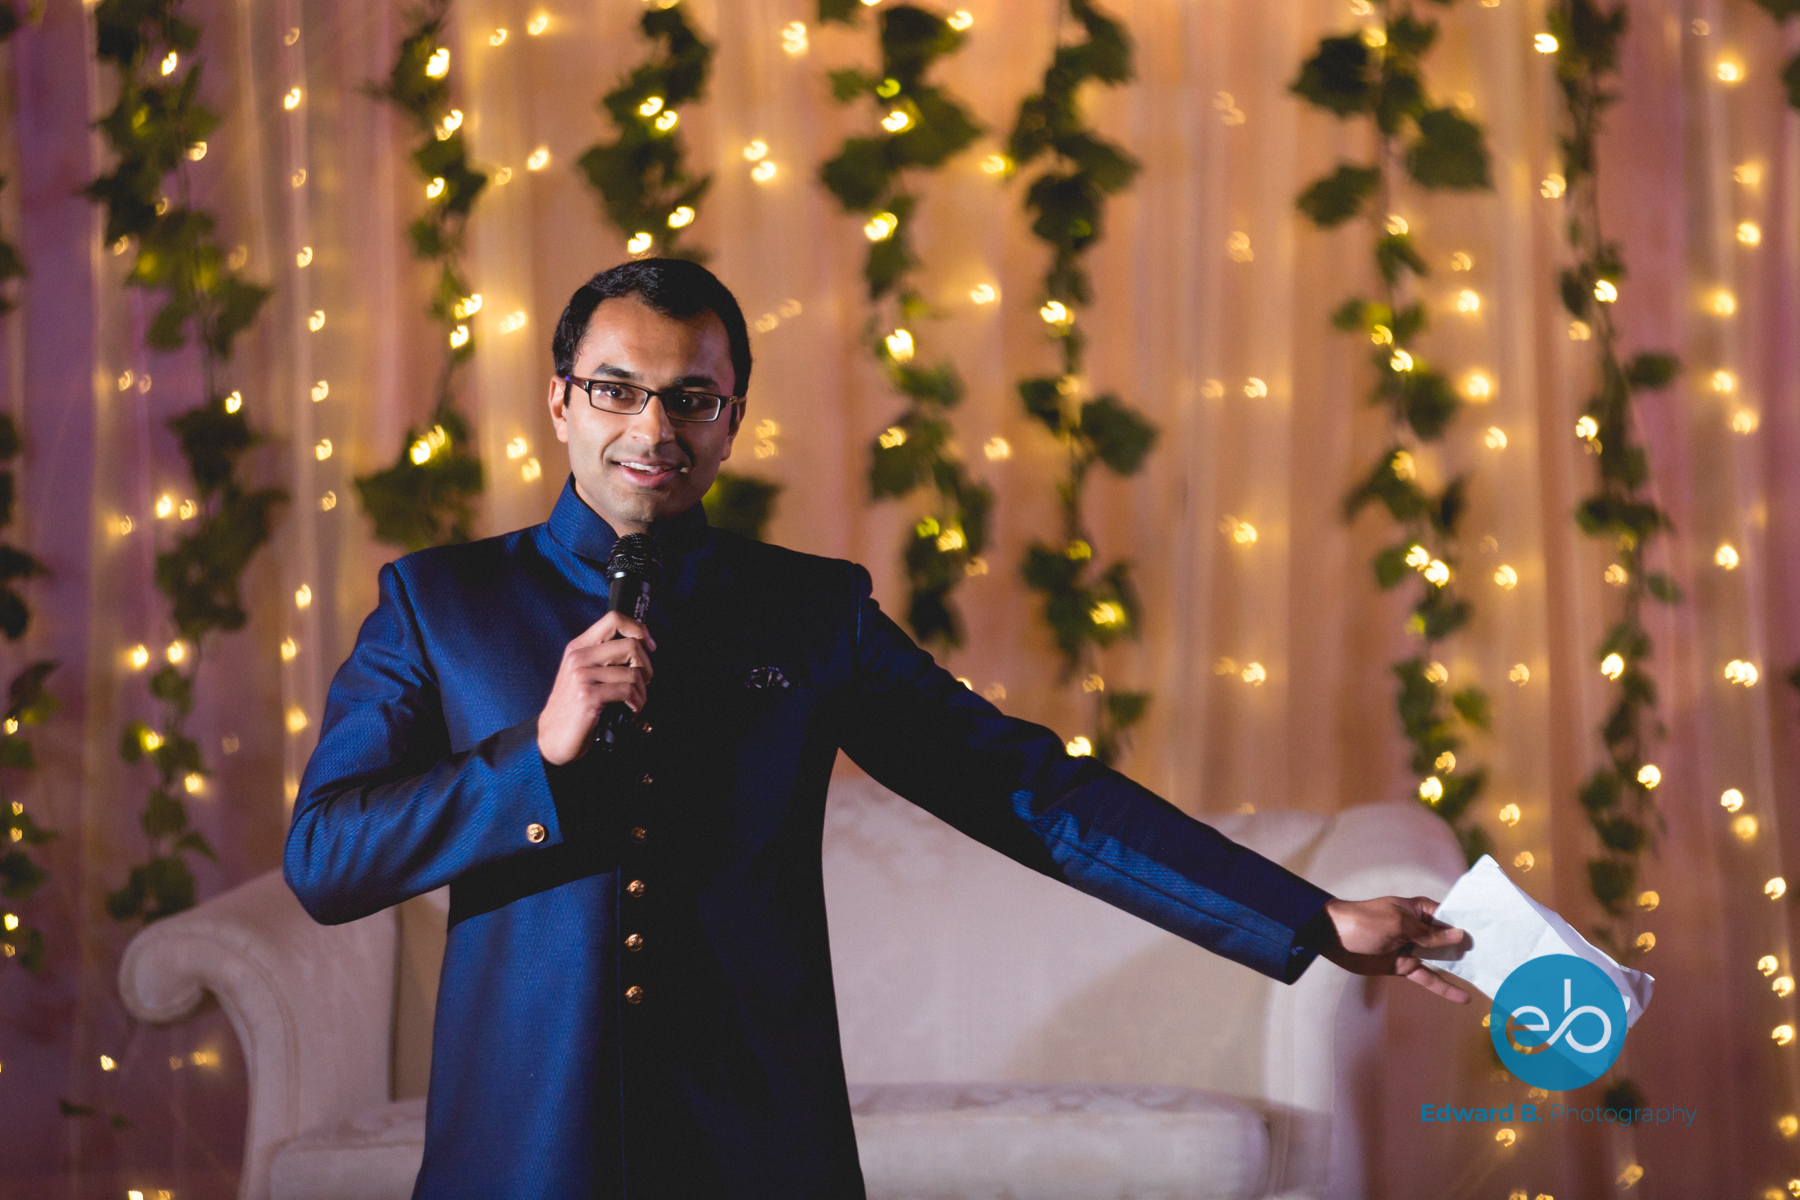 indian-wedding-engagement-reception-san-antonio-austin-texas-18.jpg